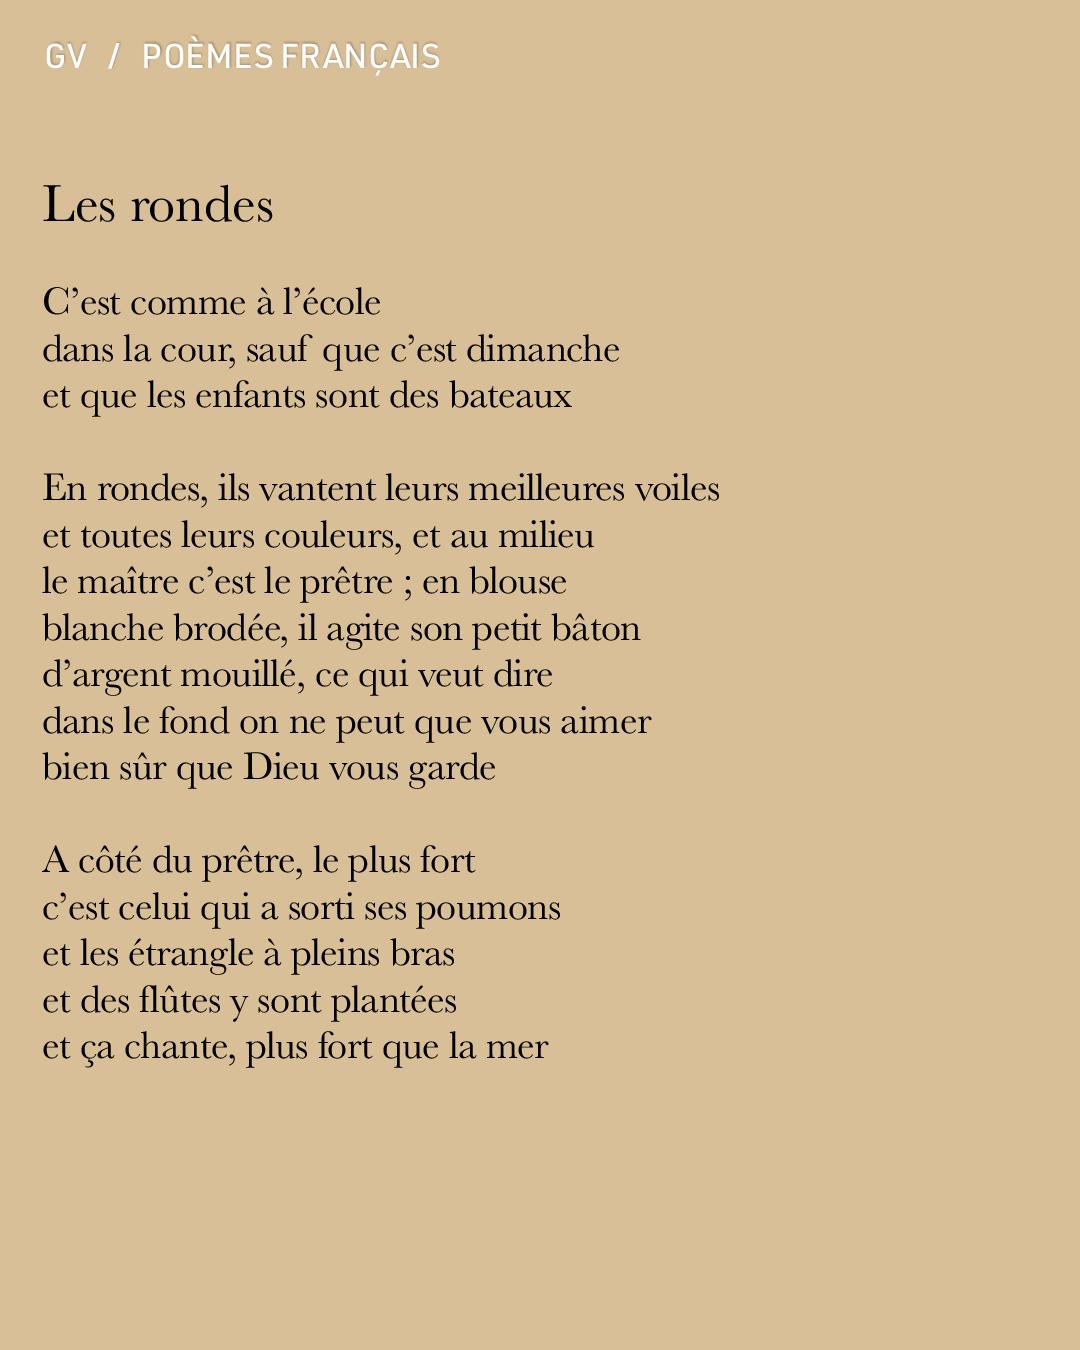 Gvion-PoemesF-LesRondes.jpg